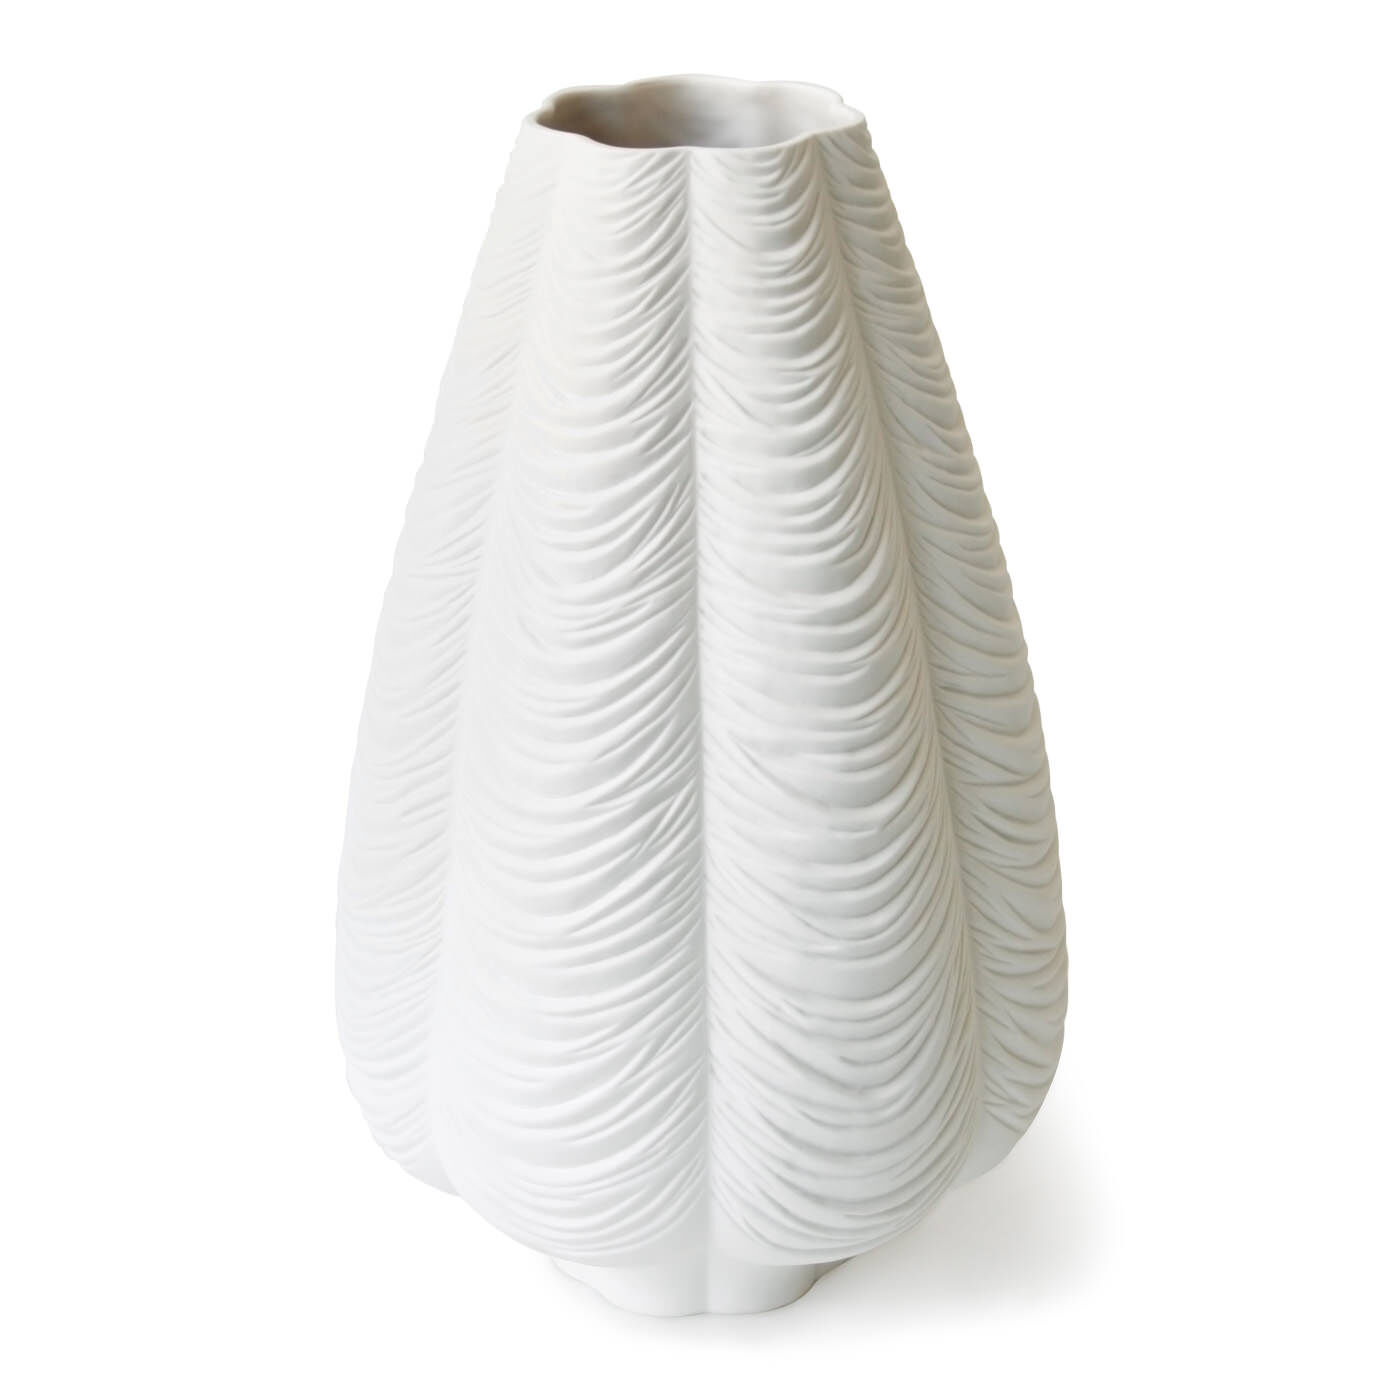 vases charade drape vase